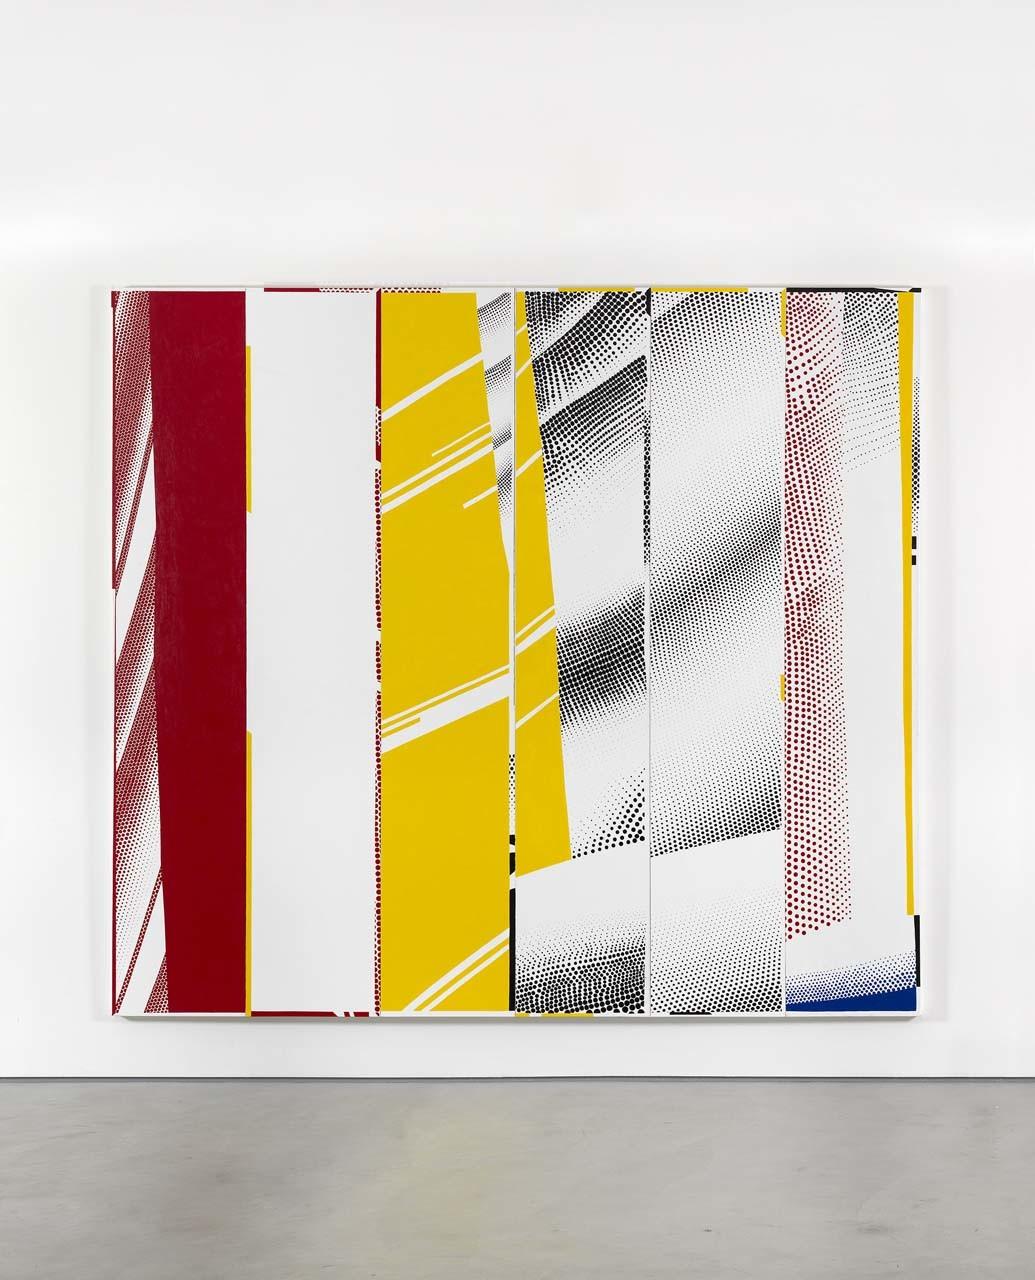 "<div class=""artwork_caption""><p>Group Self-portrait in ""Mirror #3 (Six Panels) (Paul, Ioana, Jonathan P., Riley, John, Stephanie), 2015</p></div>"